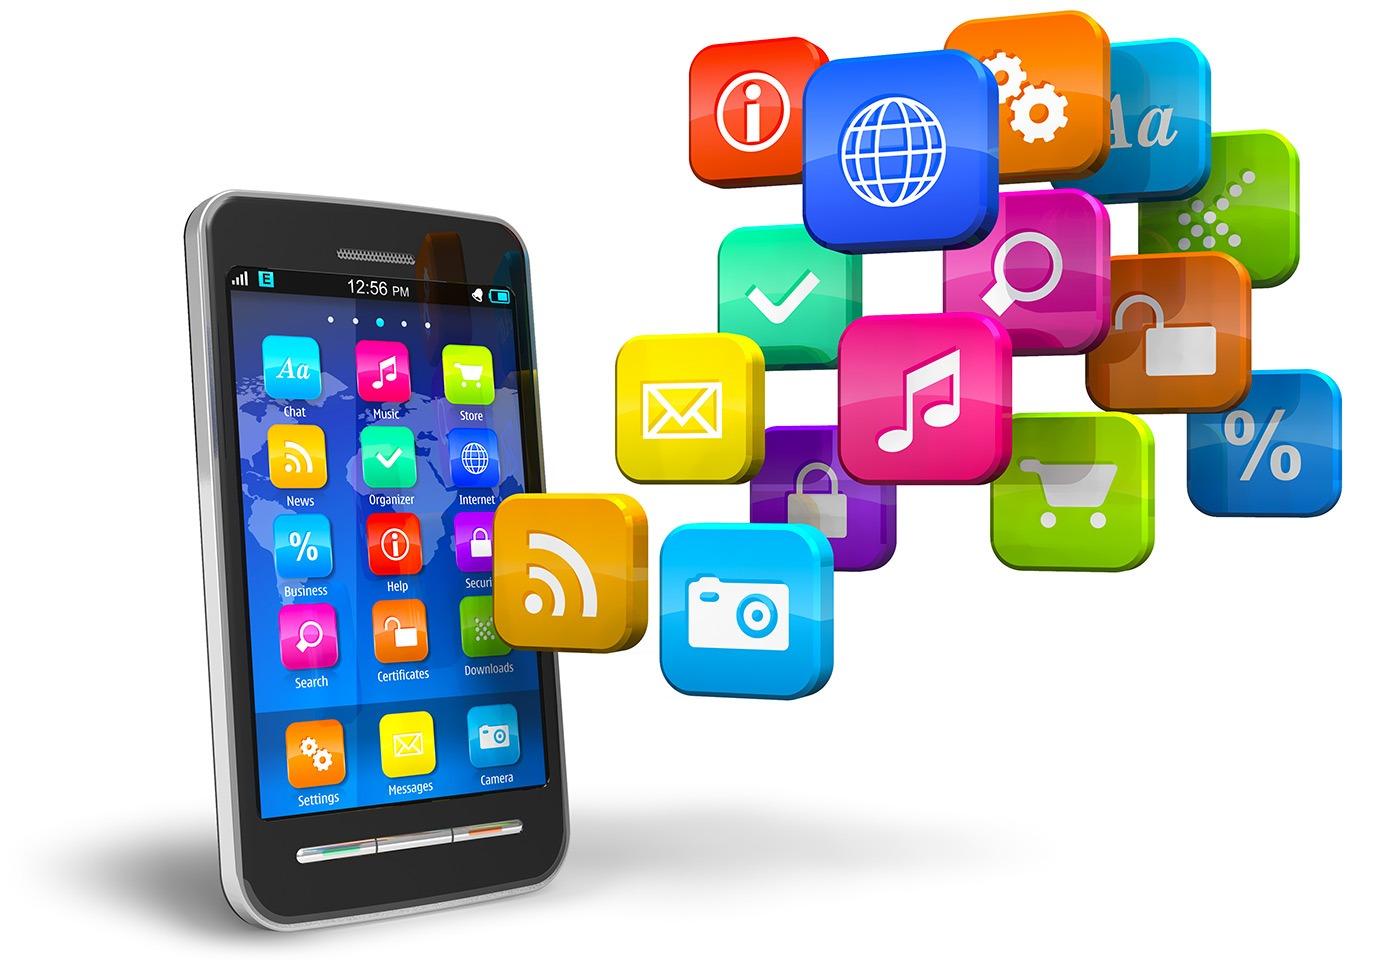 design to create a mobile app